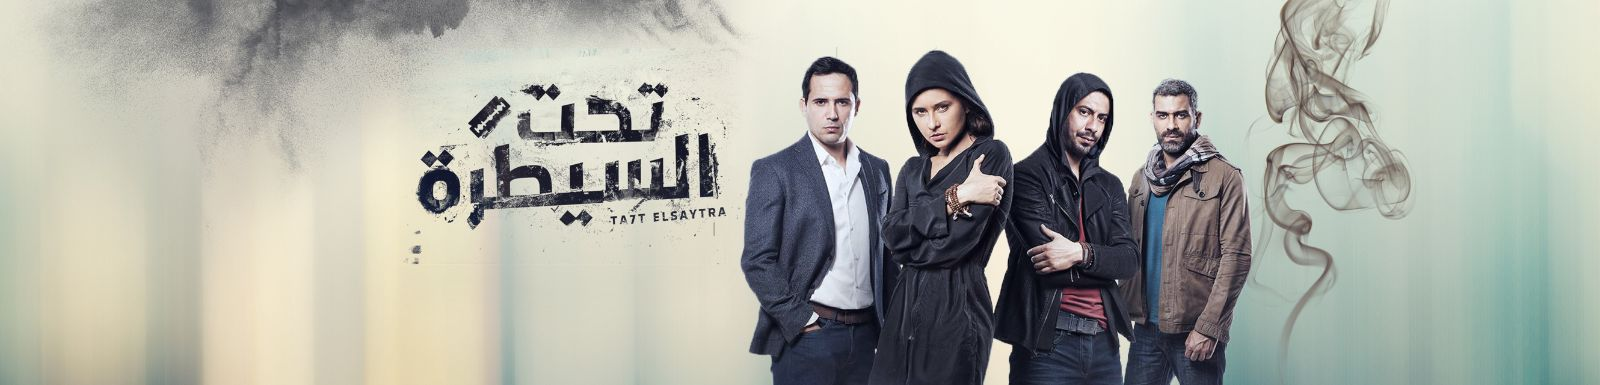 ����� ����� ��� ������� ������ 3 MBC shahid ���� ��